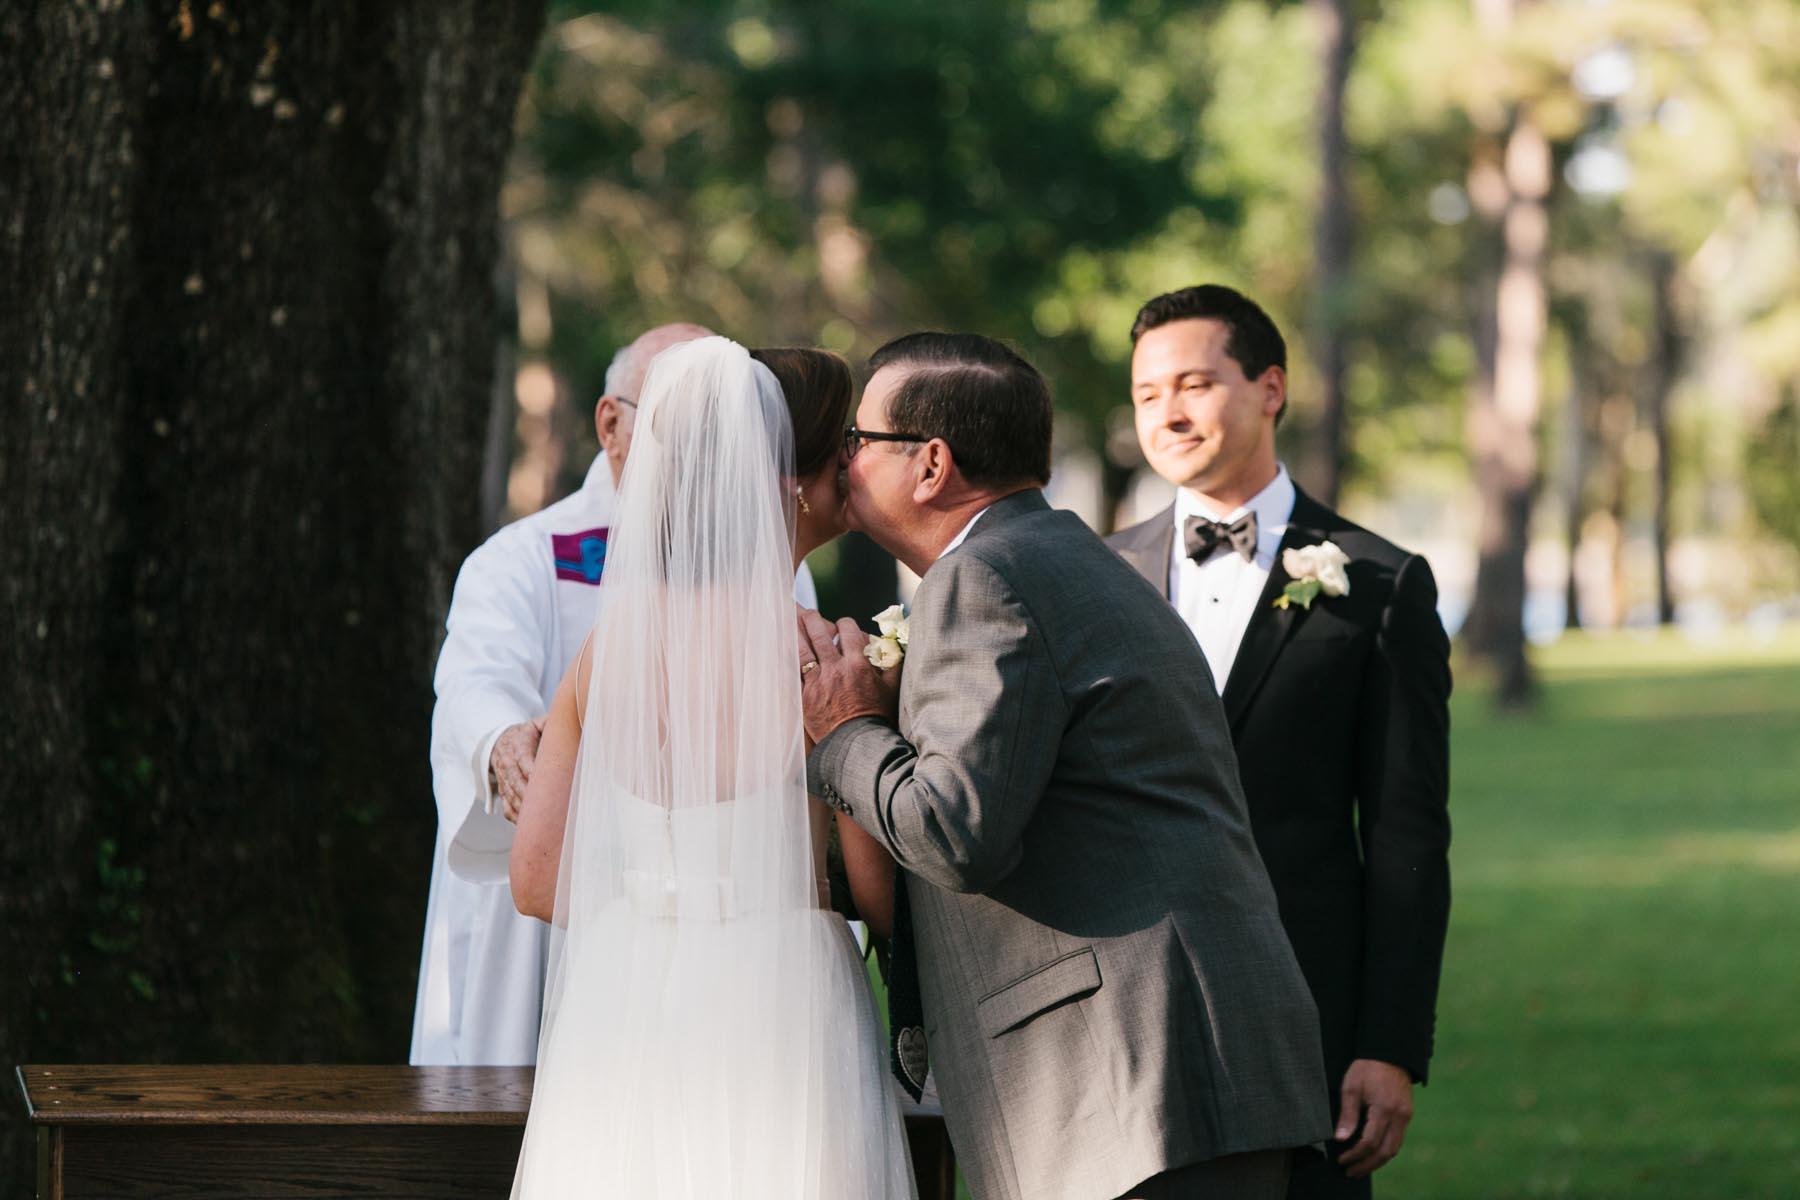 lowry wedding blog eden garden florida wedding-62